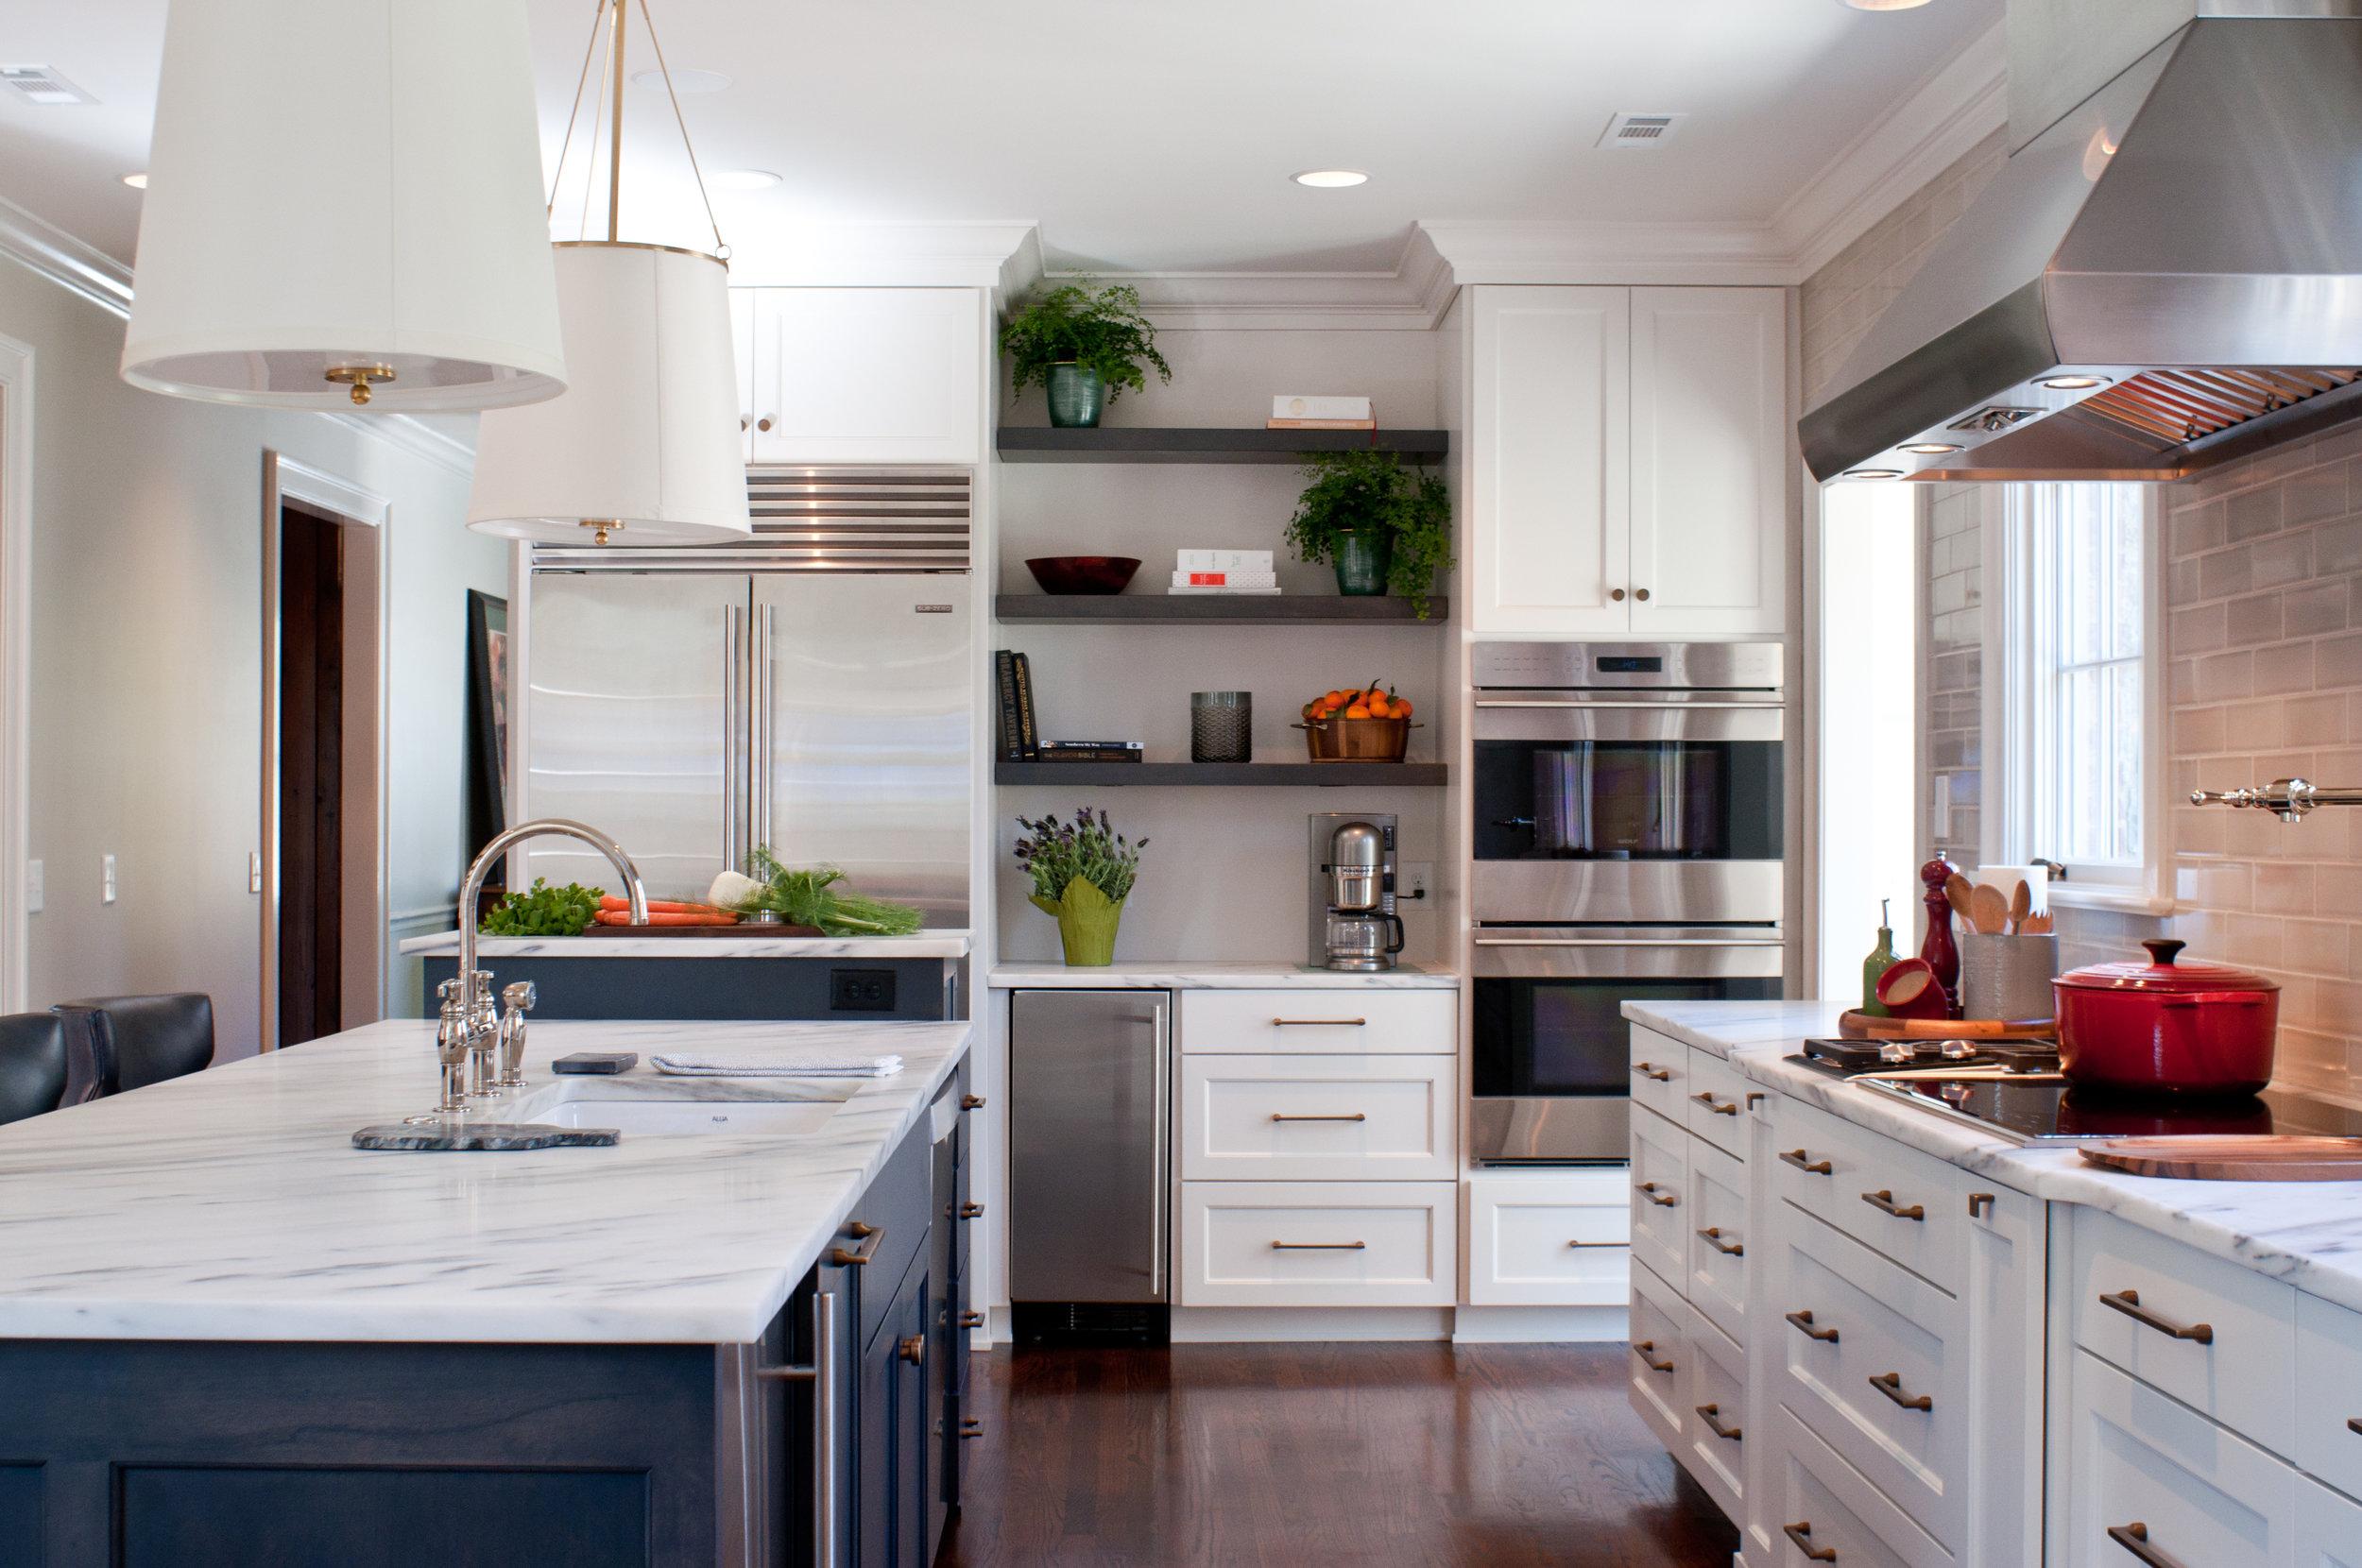 Transitional+Barrett+Kitchen+4.jpg